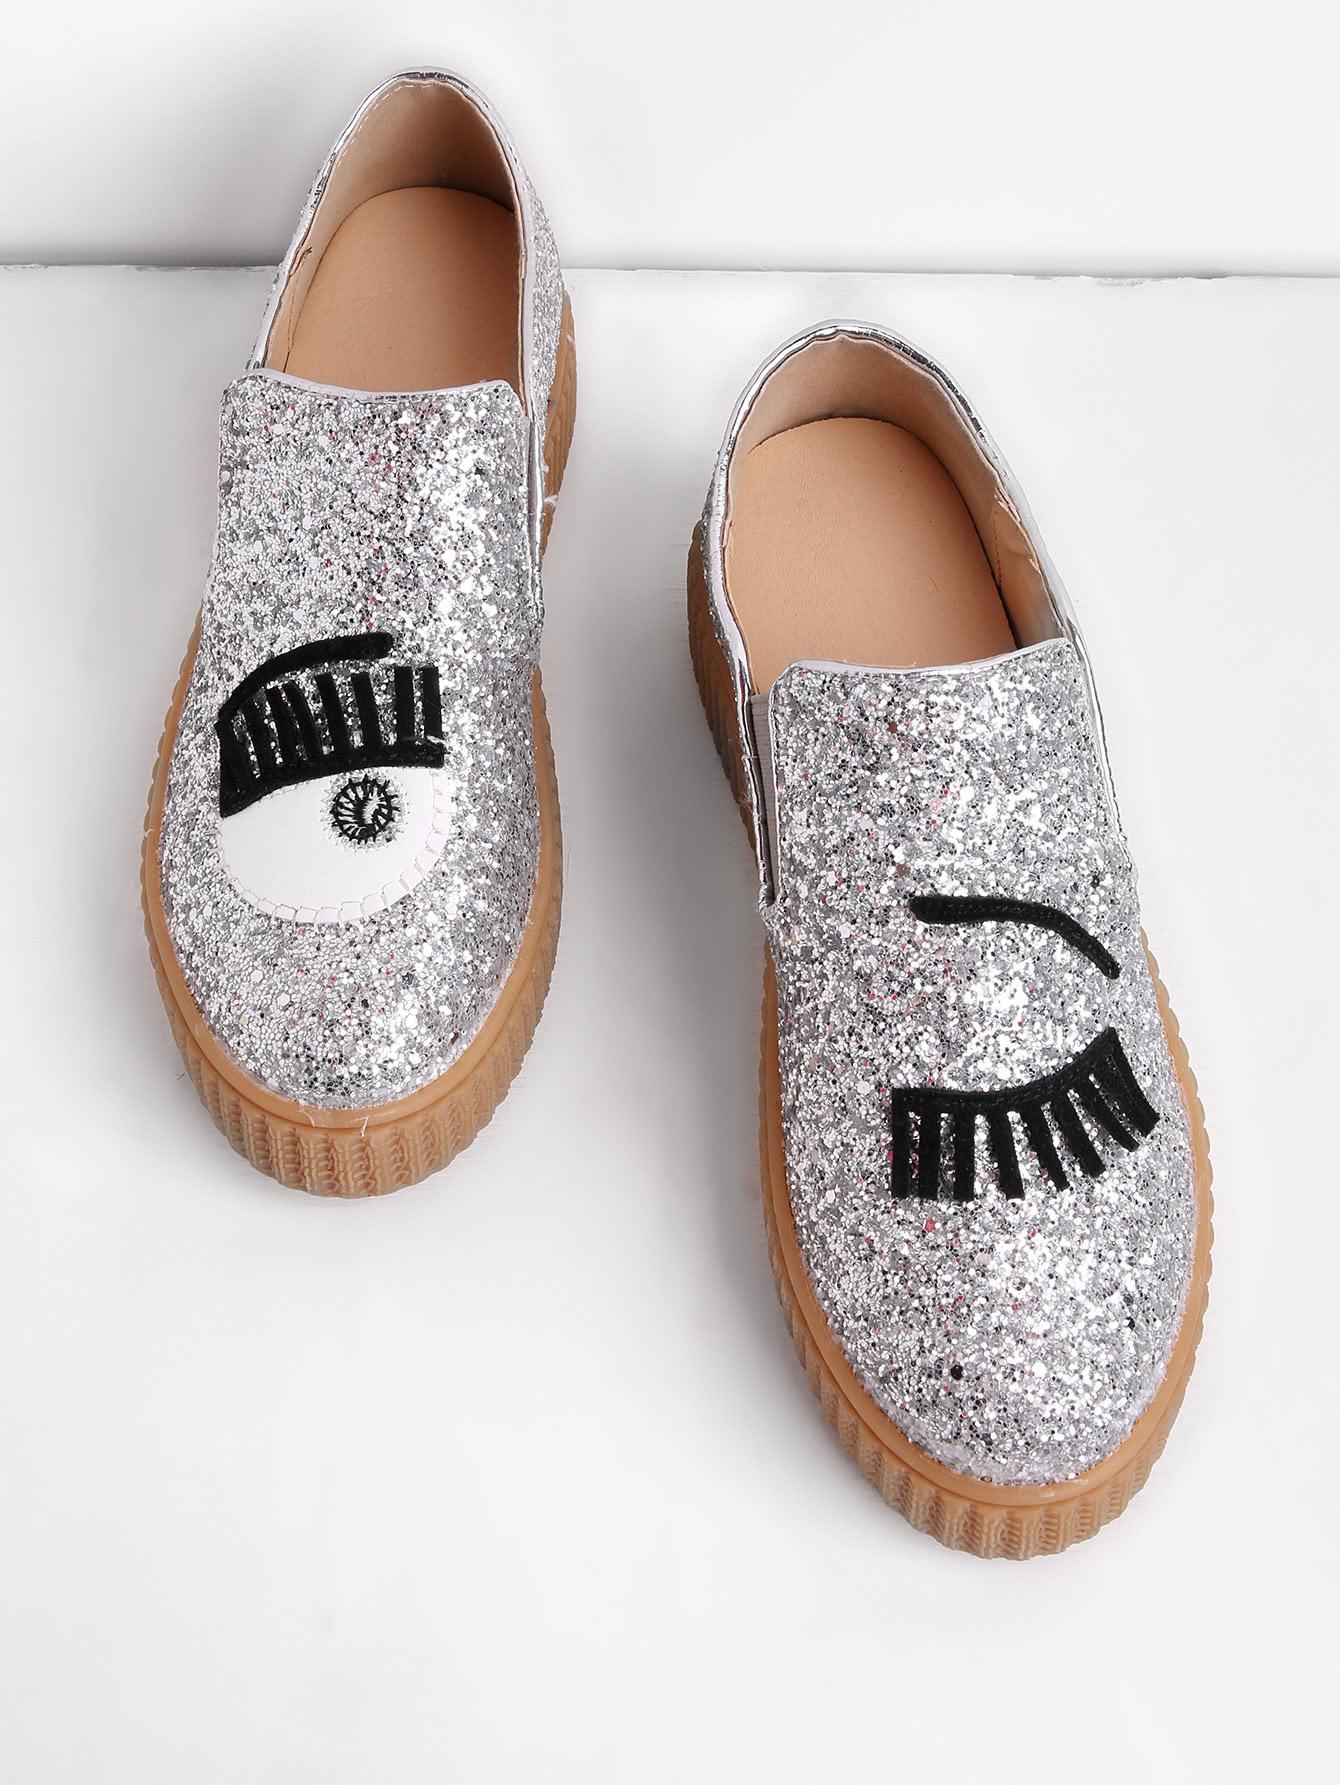 Eyelash Pattern Glitter Slip On Plimsolls shoes170719808